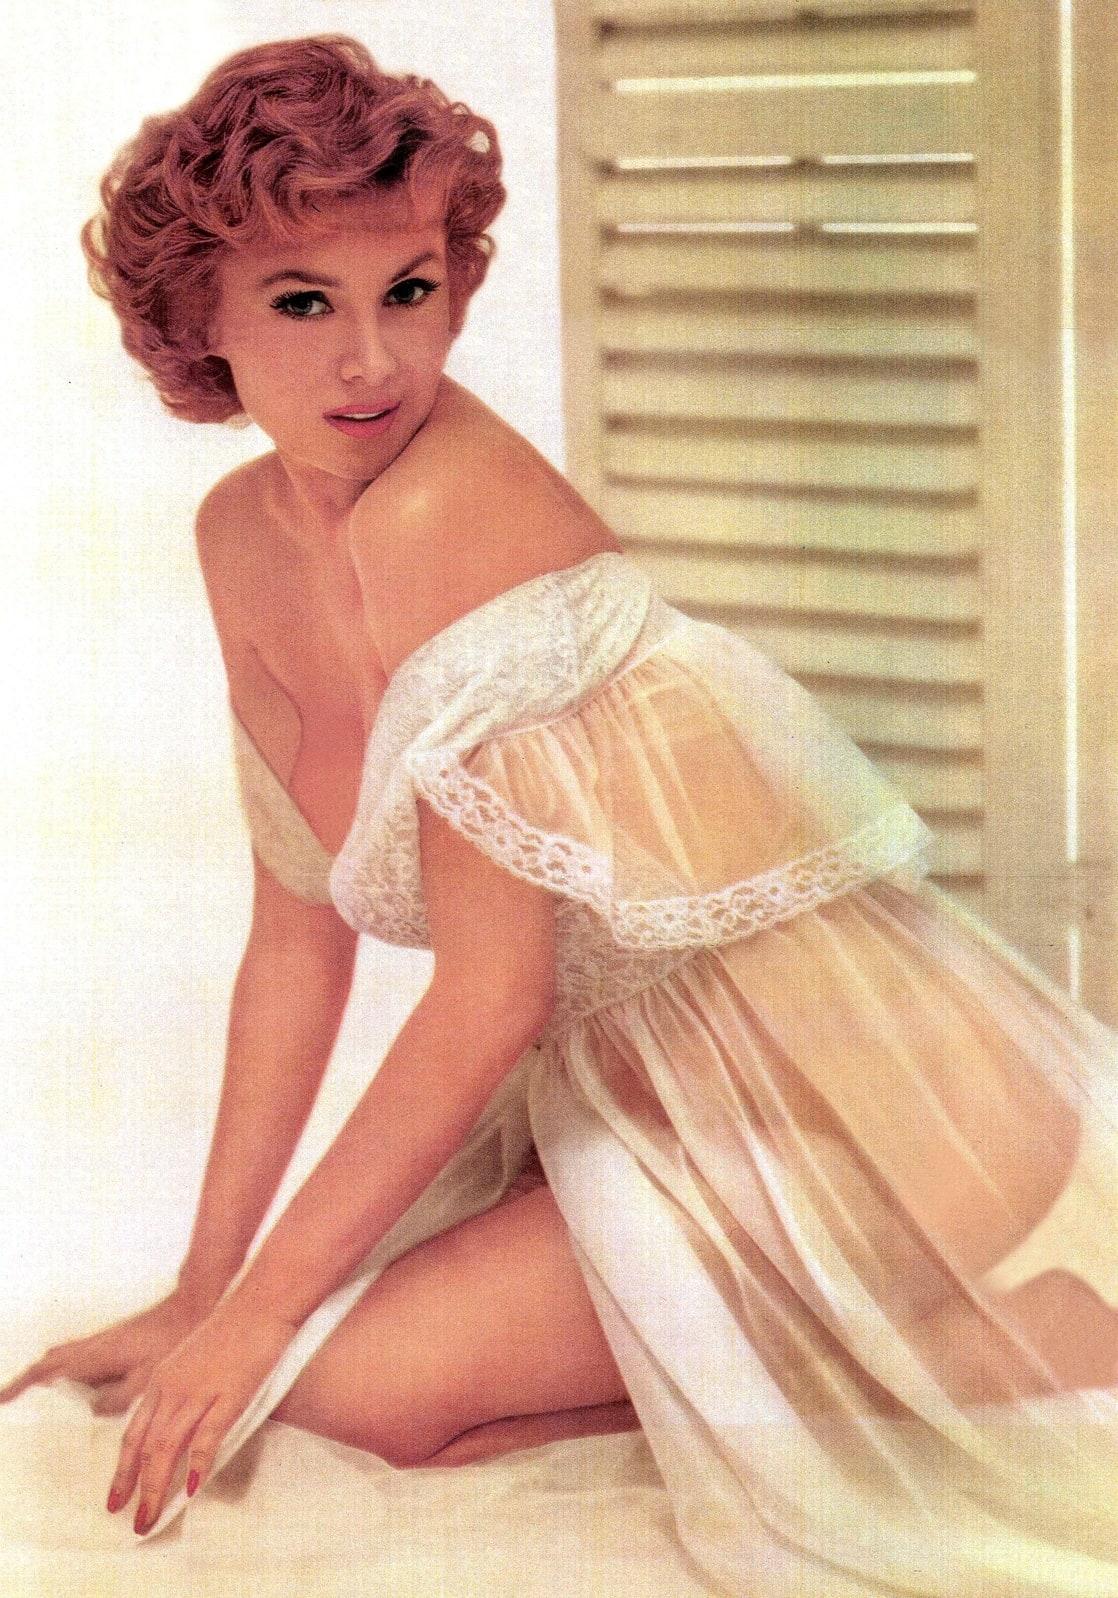 Stoya,Jane Russell Adult clips Matt Barber (born 1983),Linda Evans born November 18, 1942 (age 75)